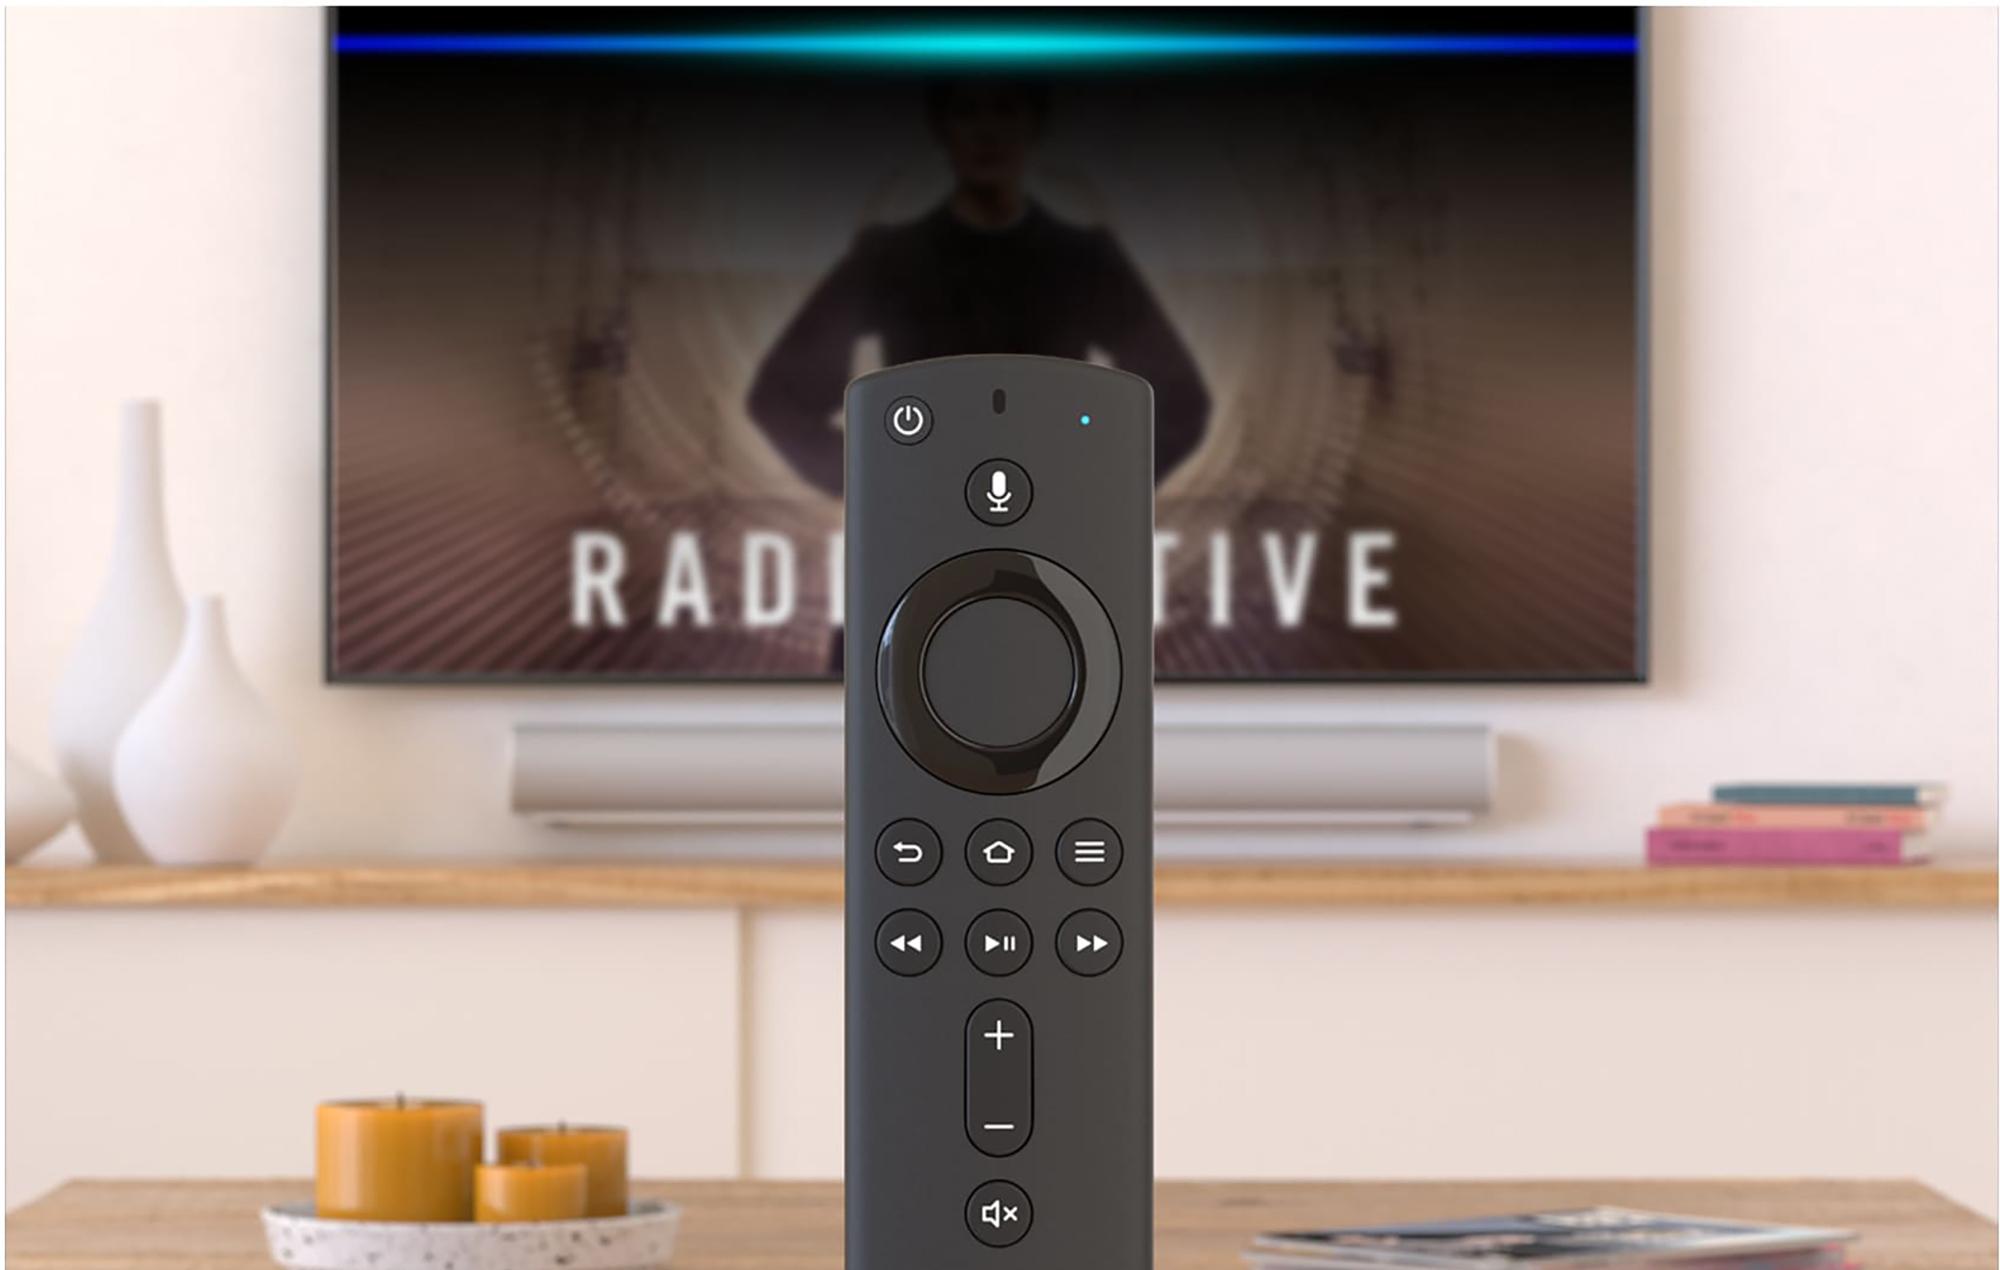 Amazon's Fire TV Stick